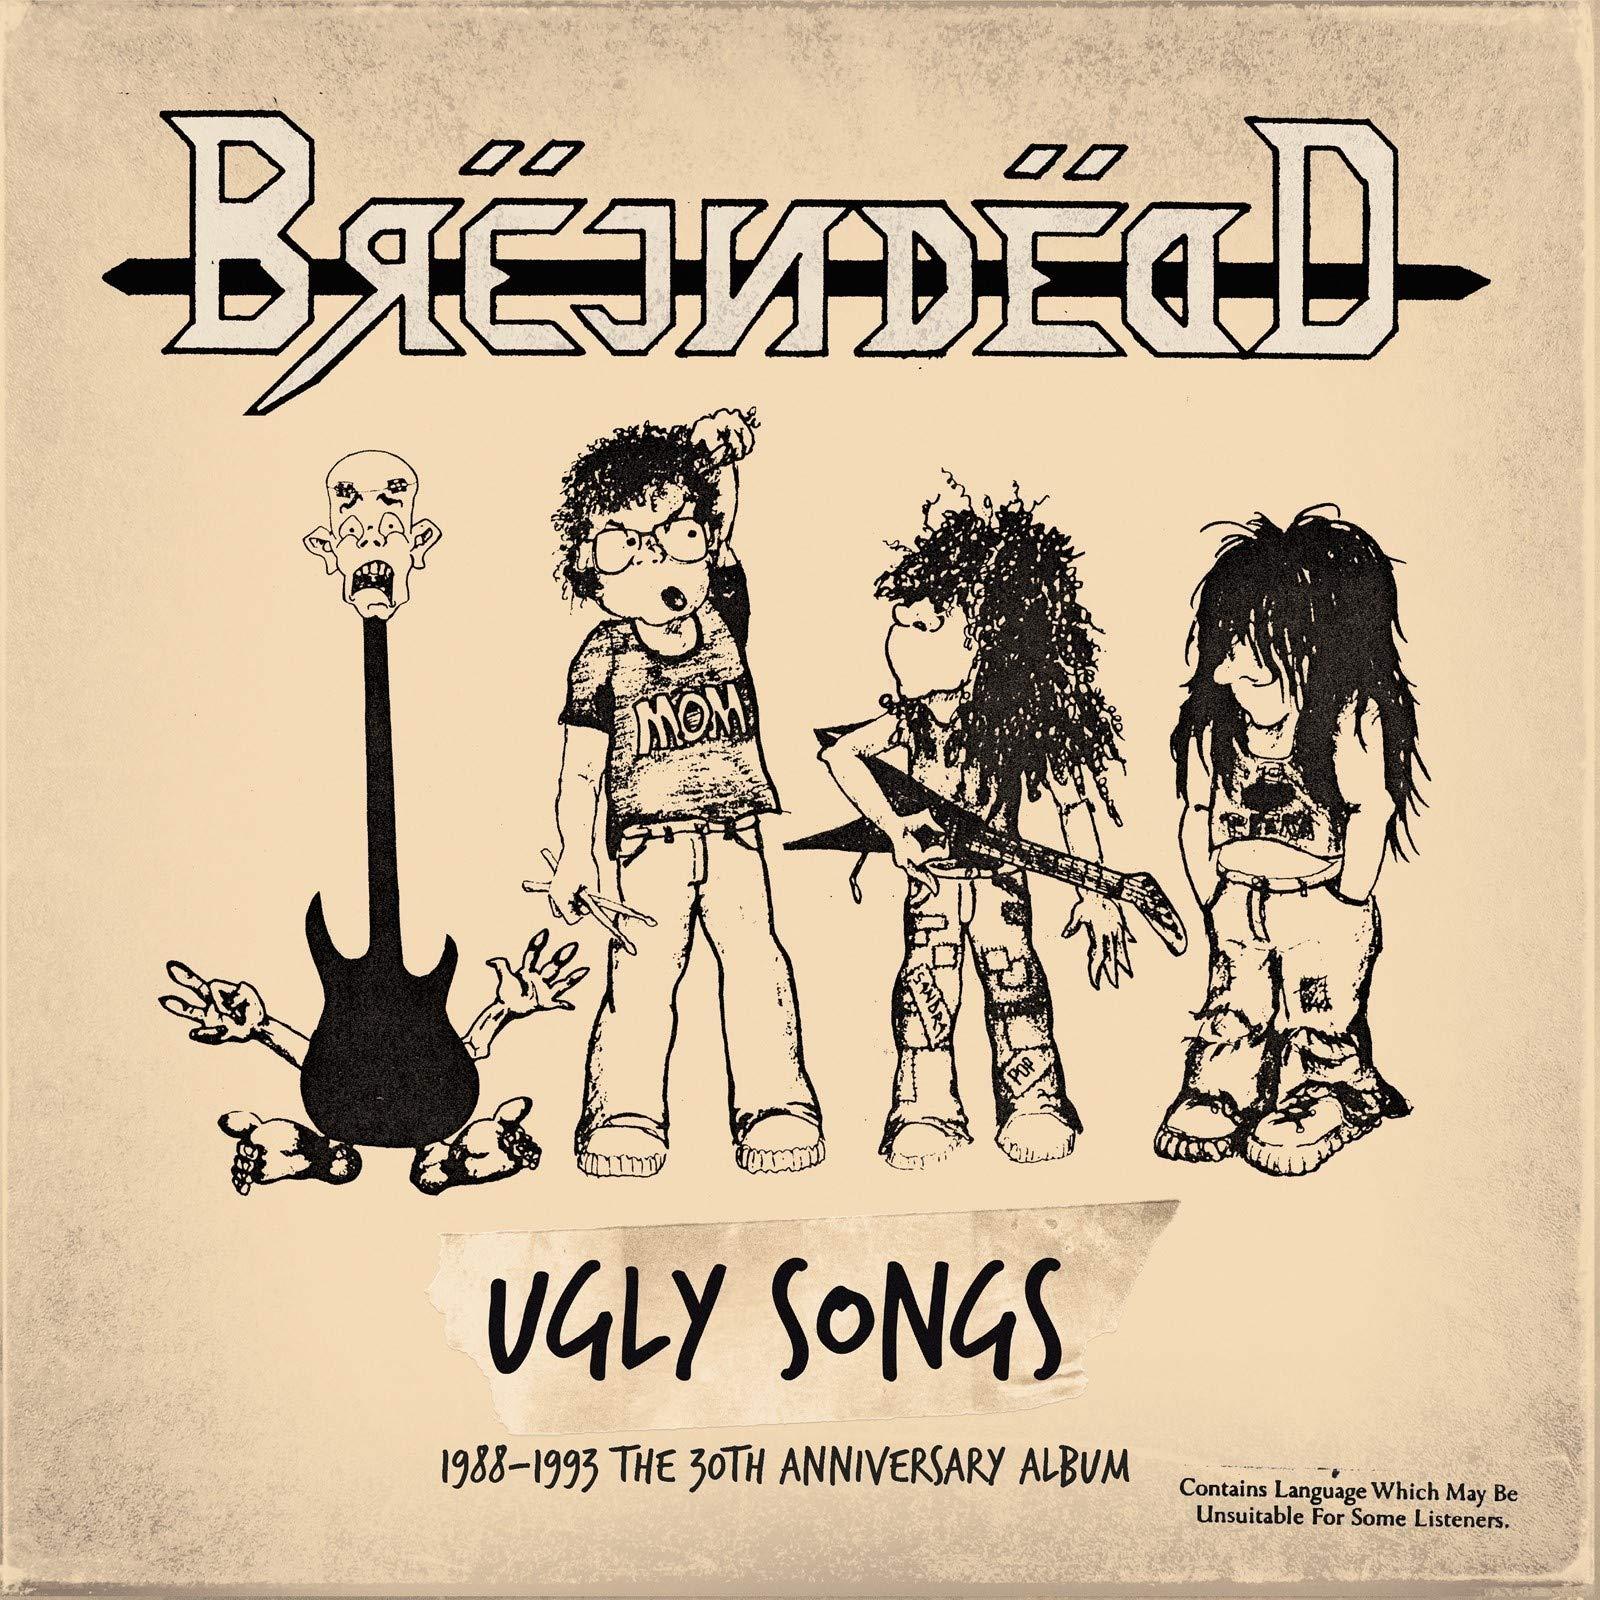 Vinilo : Brejndead - Ugly Songs 1988-1993 (LP Vinyl)